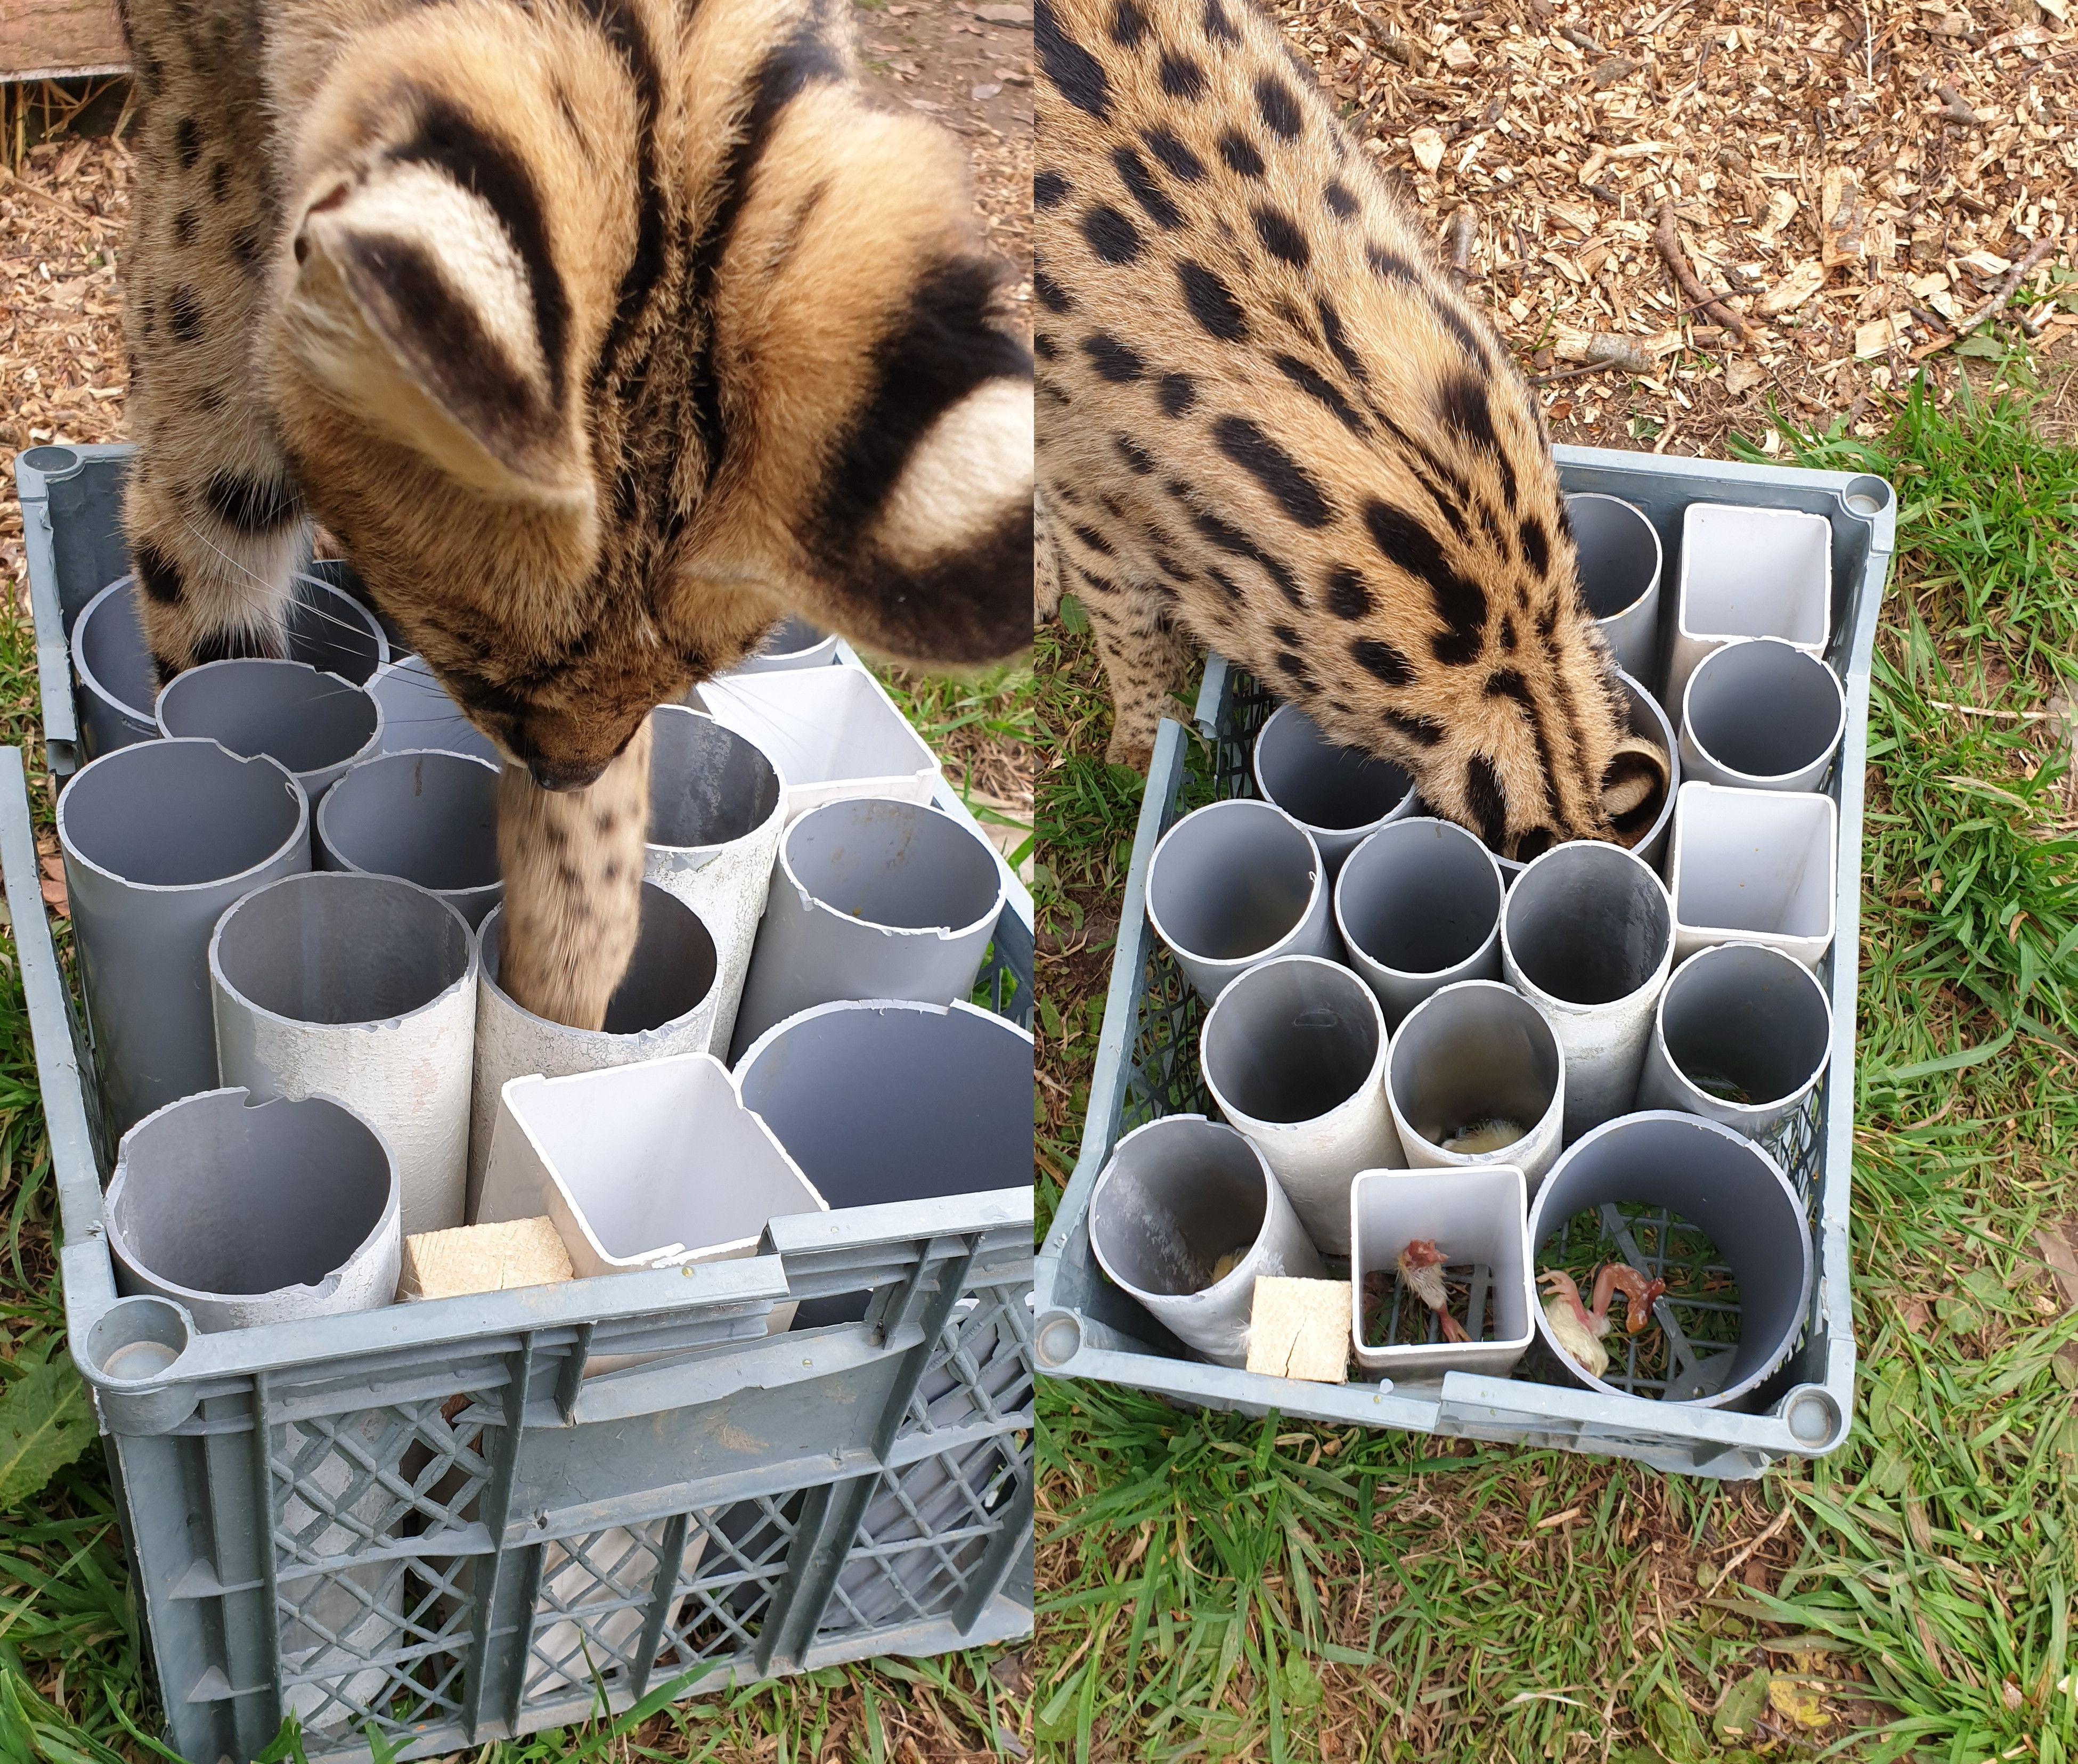 Tube Feeder Enrichment Enrichment Projects Wild Animals Photos Enrichment Activities